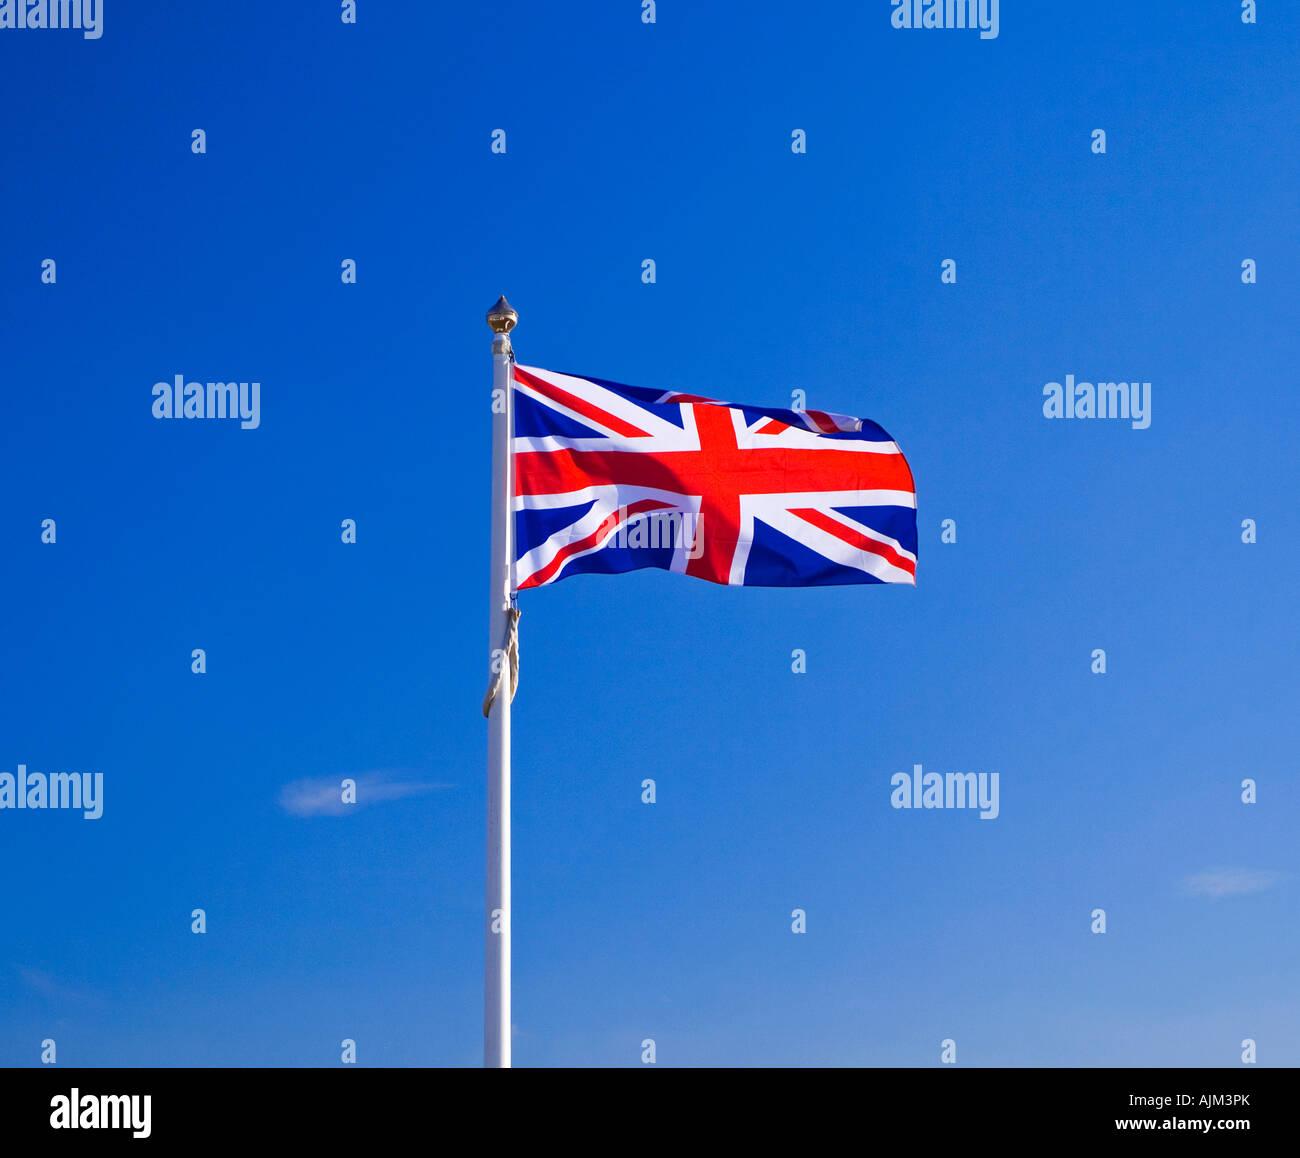 union flag of the united kingdom of england scotland wales and